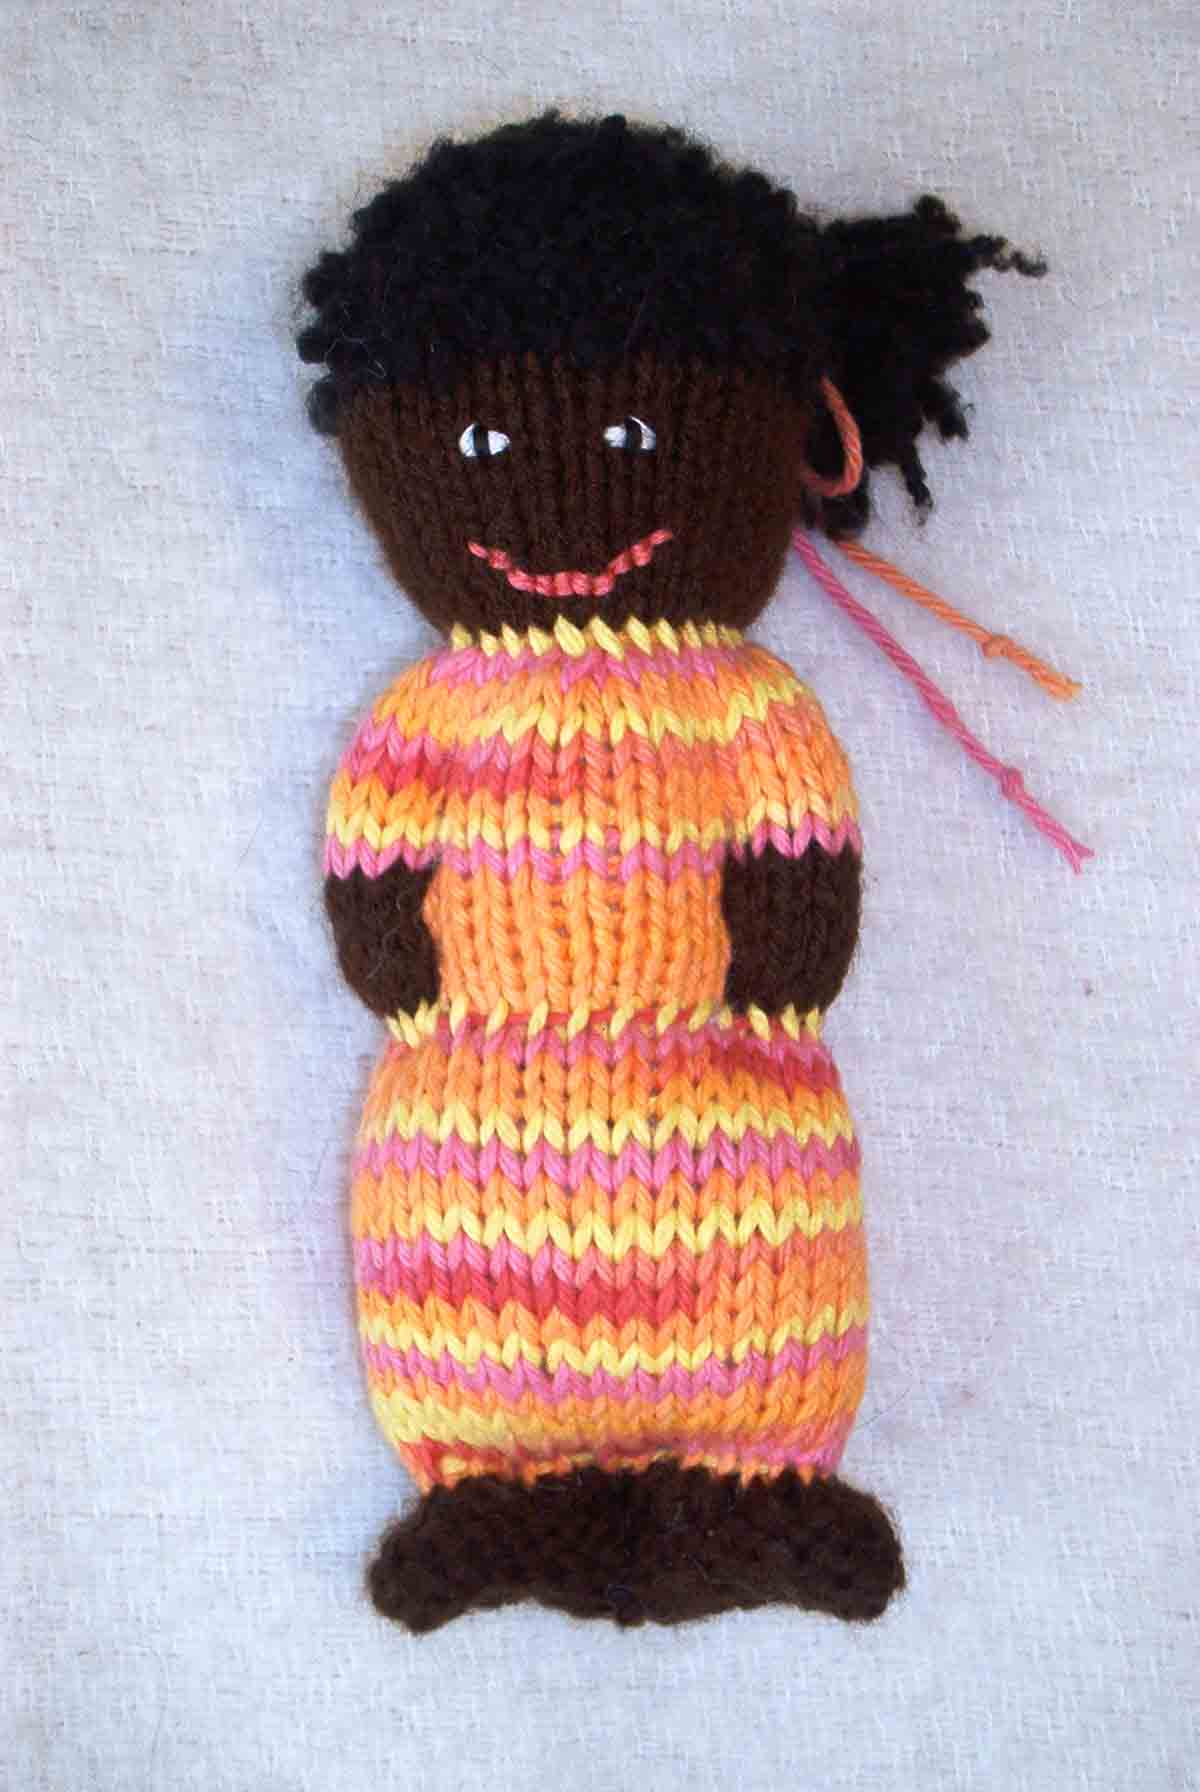 Charity Knitting Comfort Dolls Random Bits Of Projects